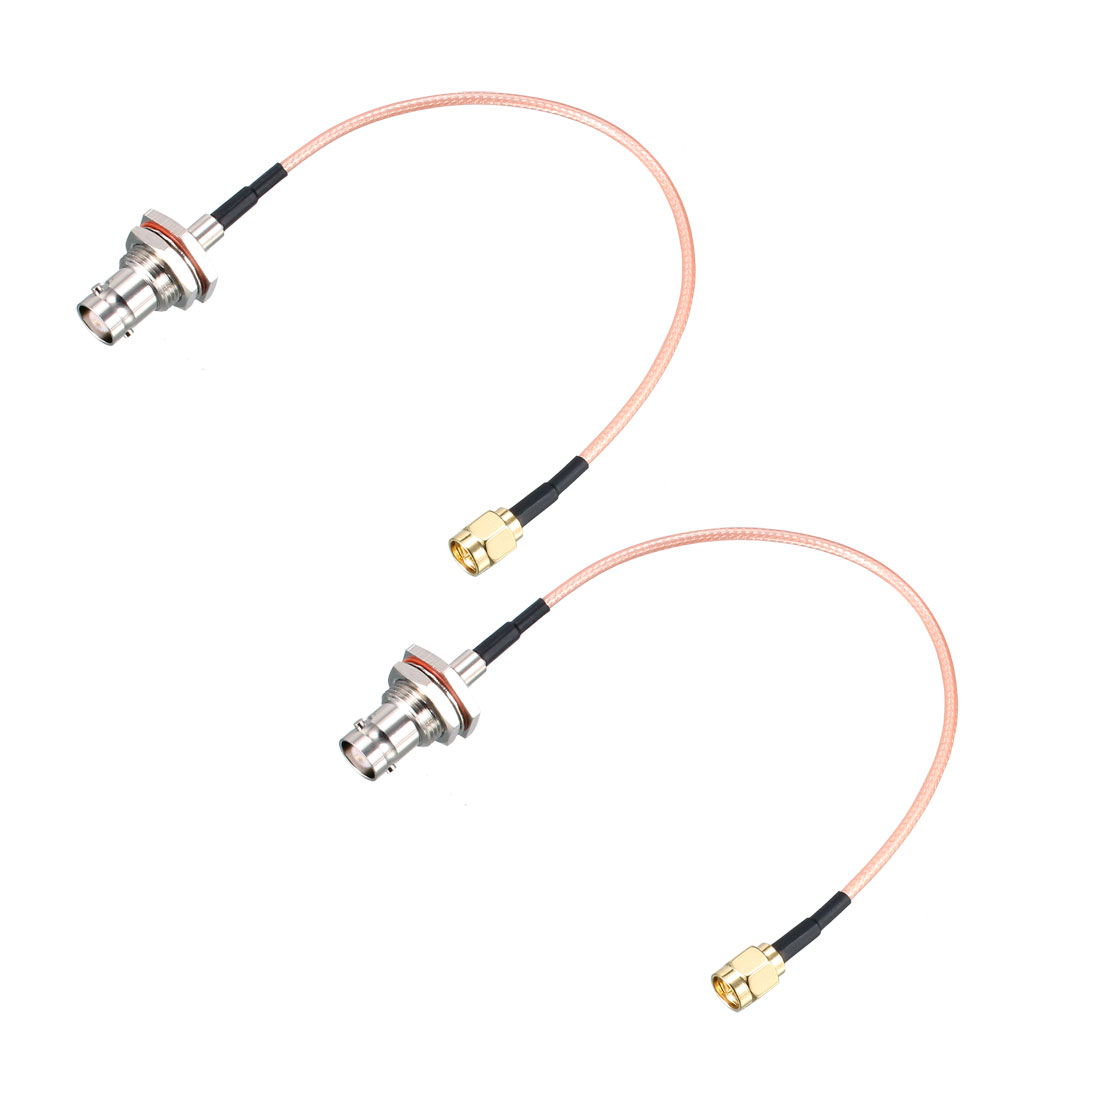 SMA Male to BNC Female Bulkhead RF Coaxial Cable RG316 Coax Cable 8 Inch 2pcs